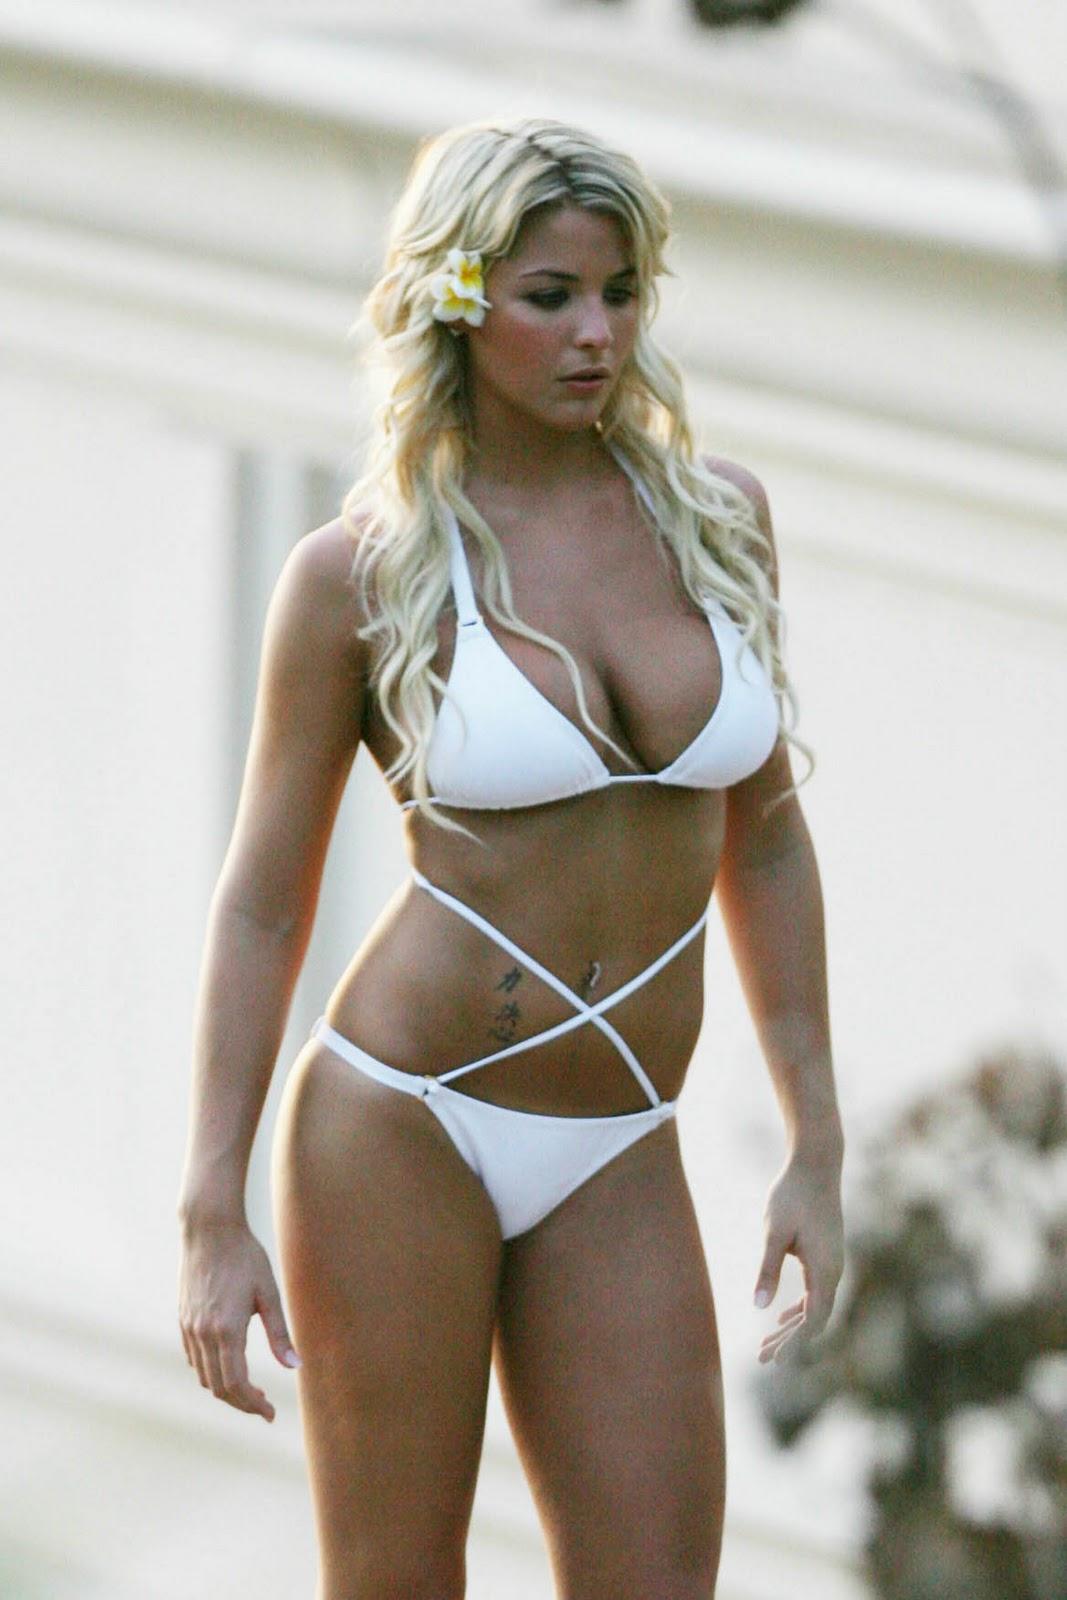 2007 Calendar Outtakes Grindhouse 2007 Imdb Skinny Vs Curvy Gemma Atkinson Beach Bikini Pictures